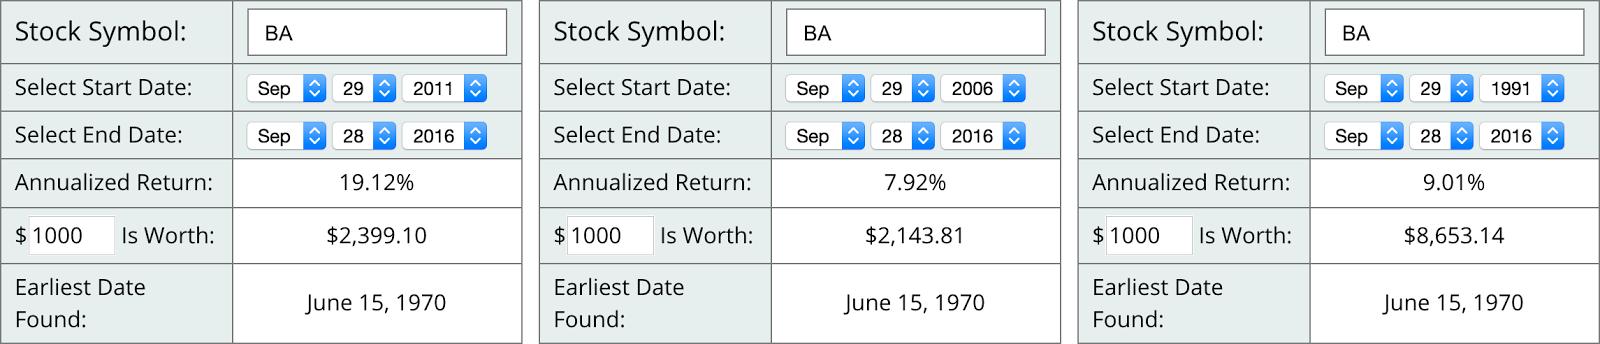 Stock Analysis The Boeing Company The Boeing Company Nyseba